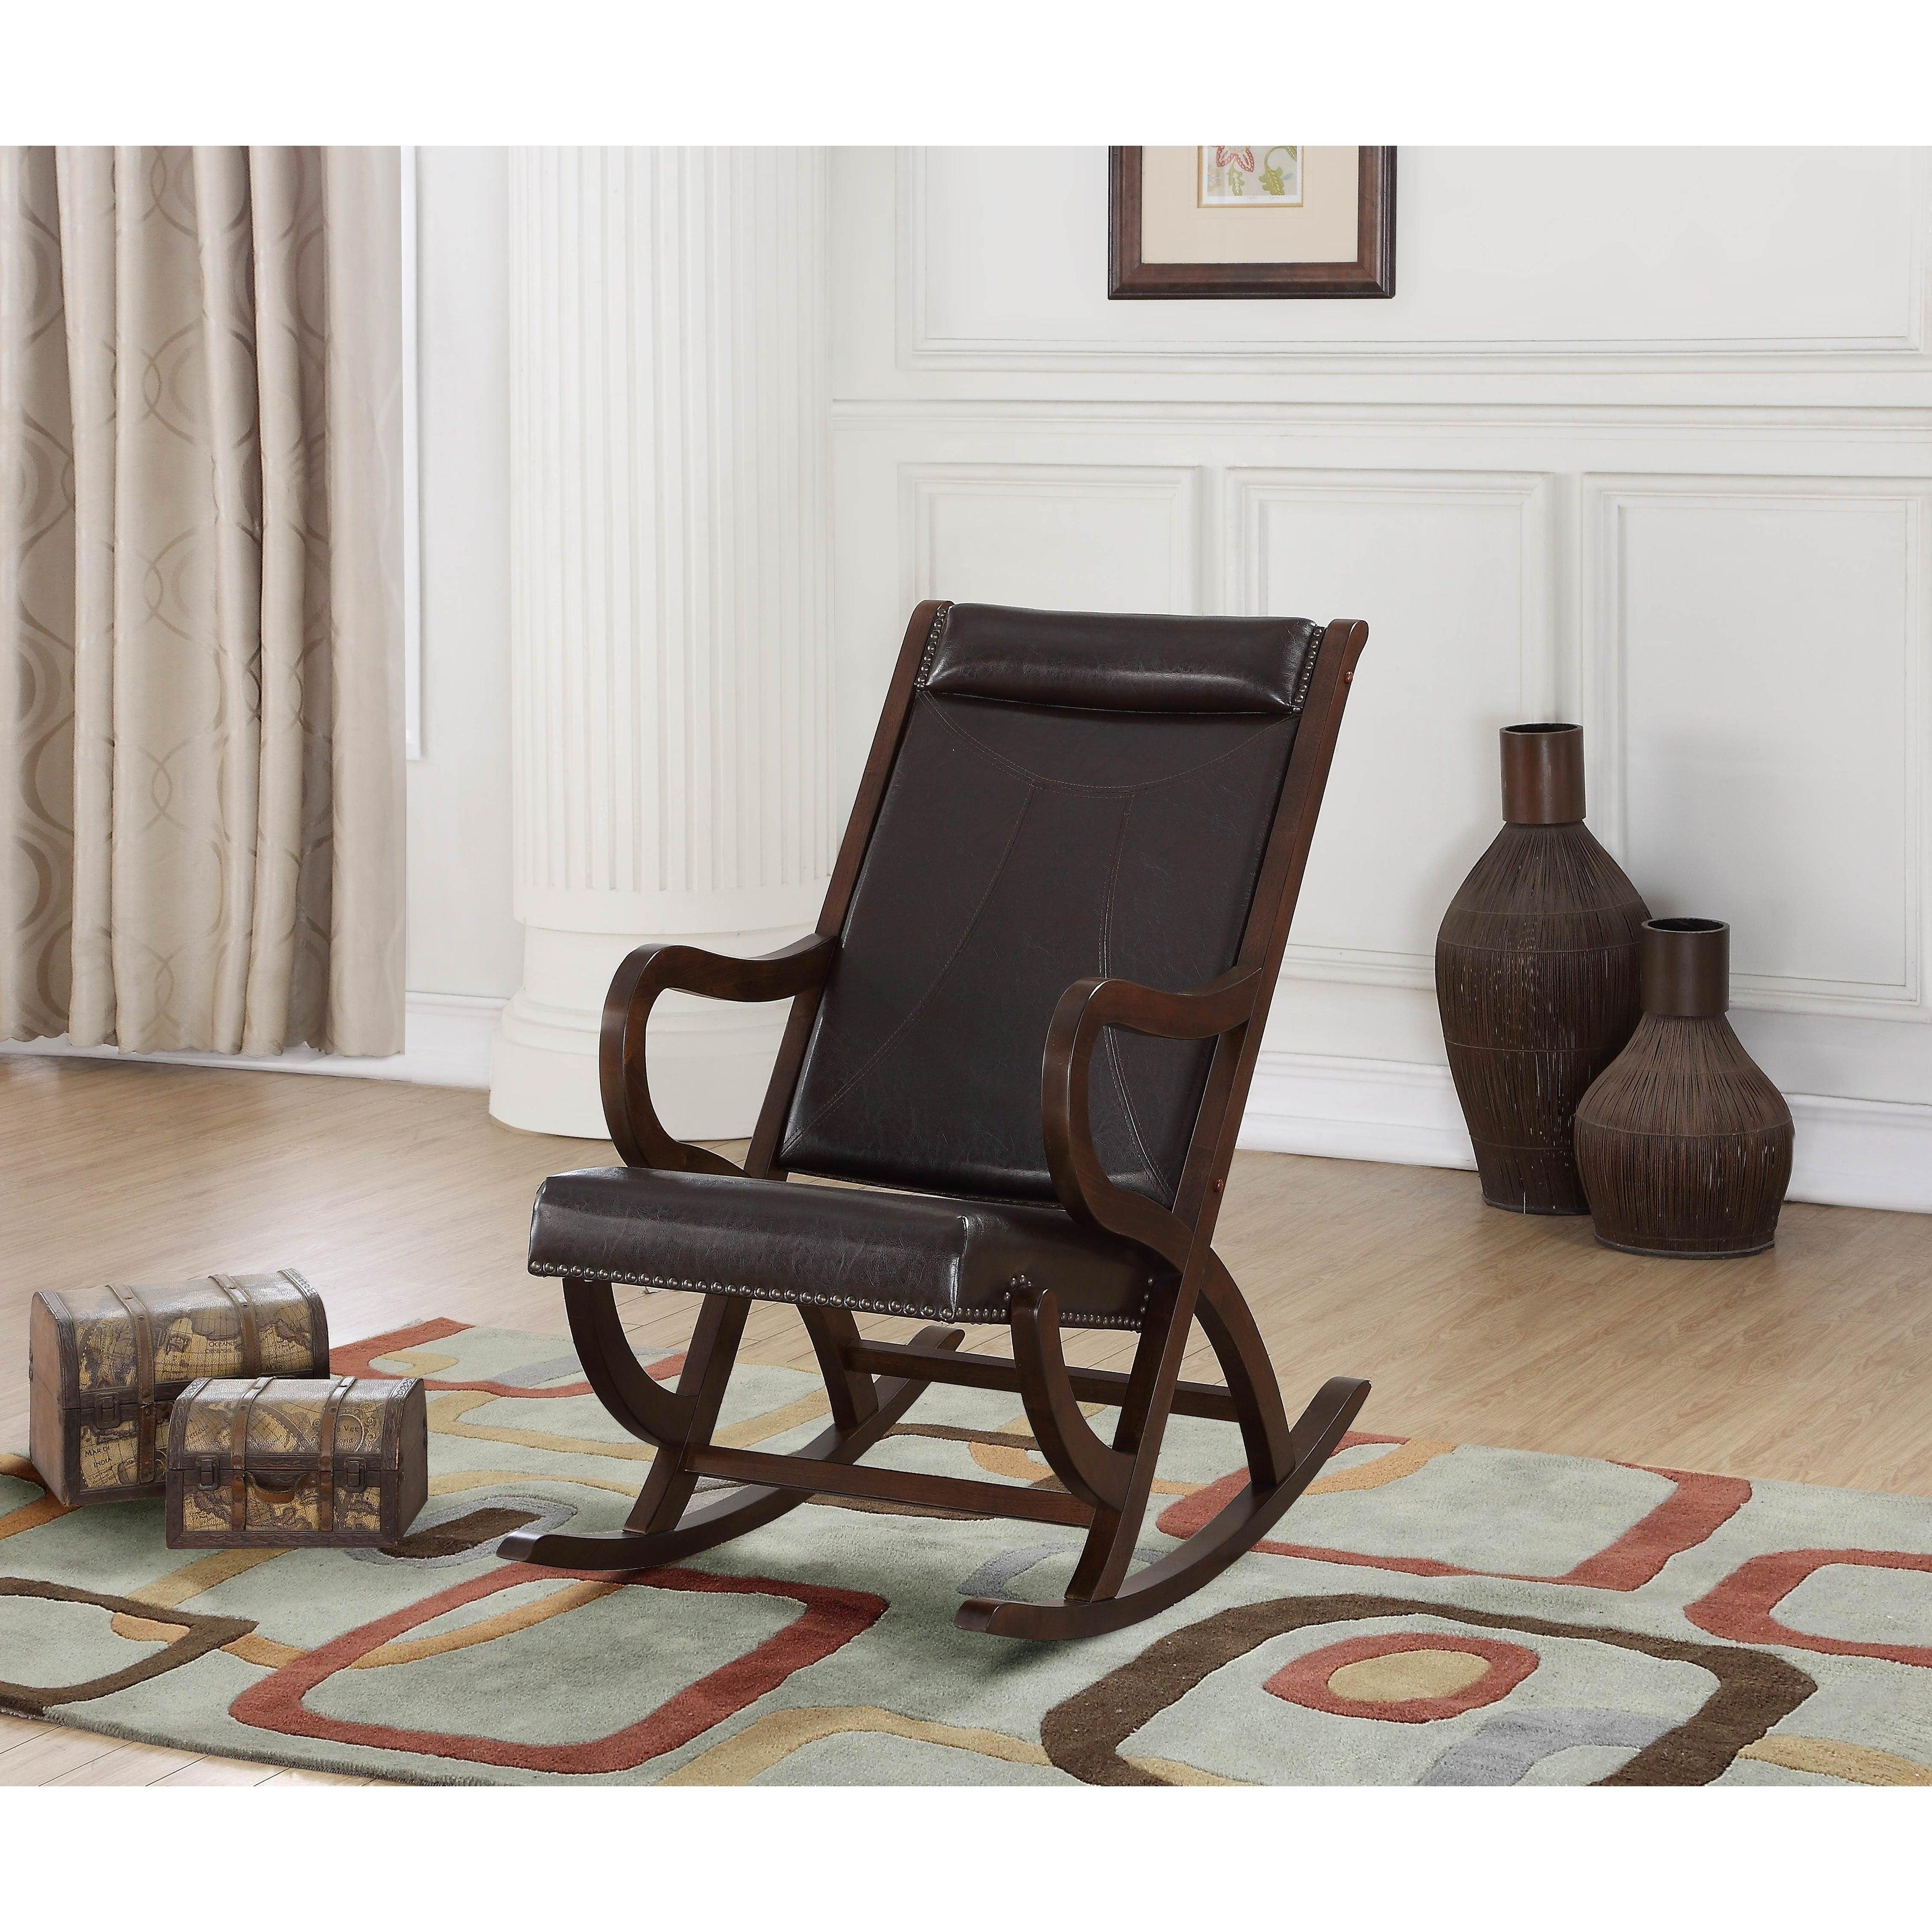 Popular Photo of Carbon Loft Ariel Rocking Chairs In Burgundy Pu And Walnut